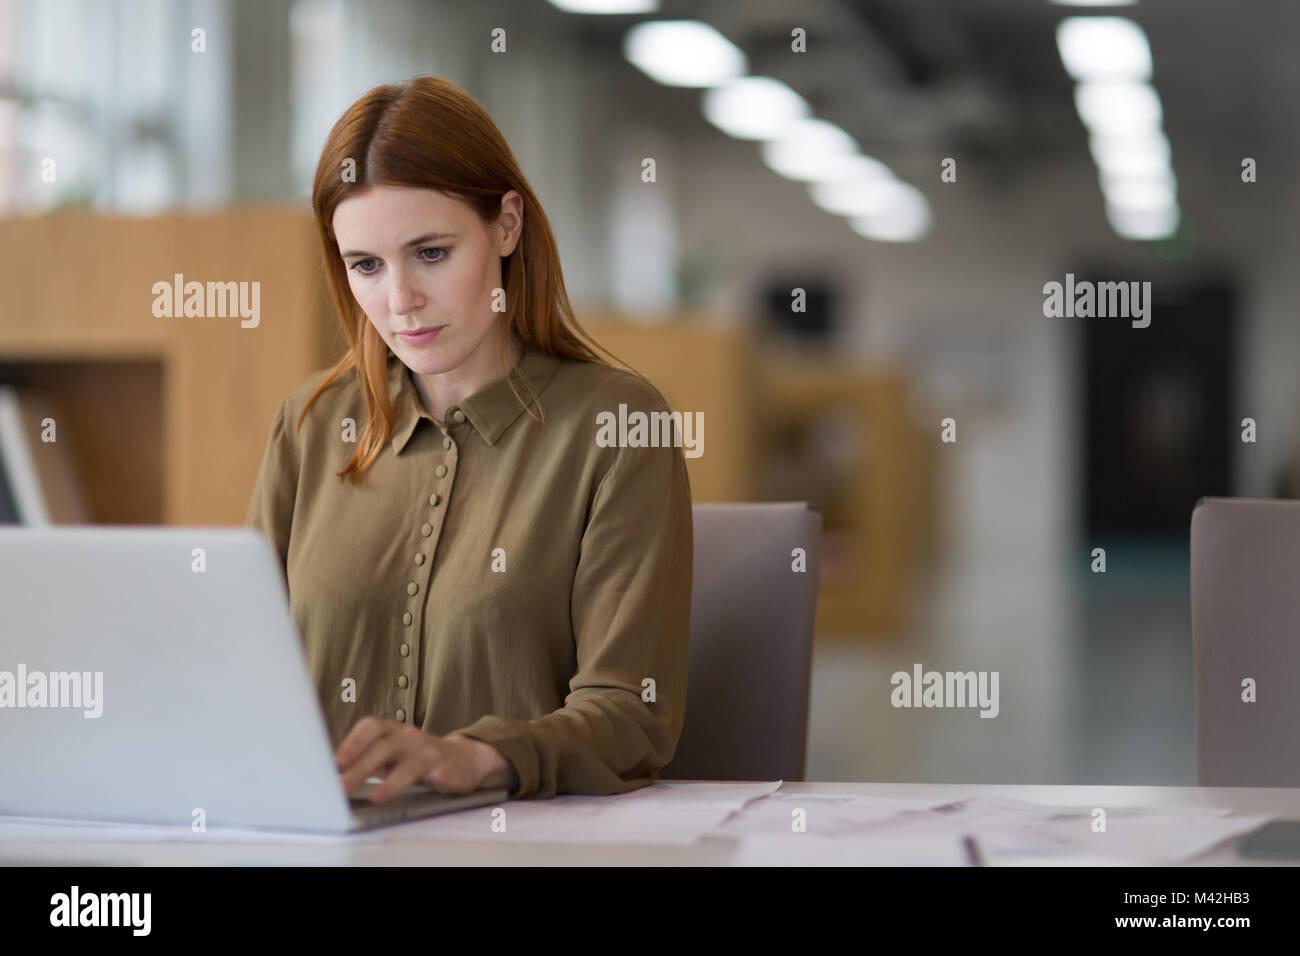 Female entrepreneur working on laptop - Stock Image